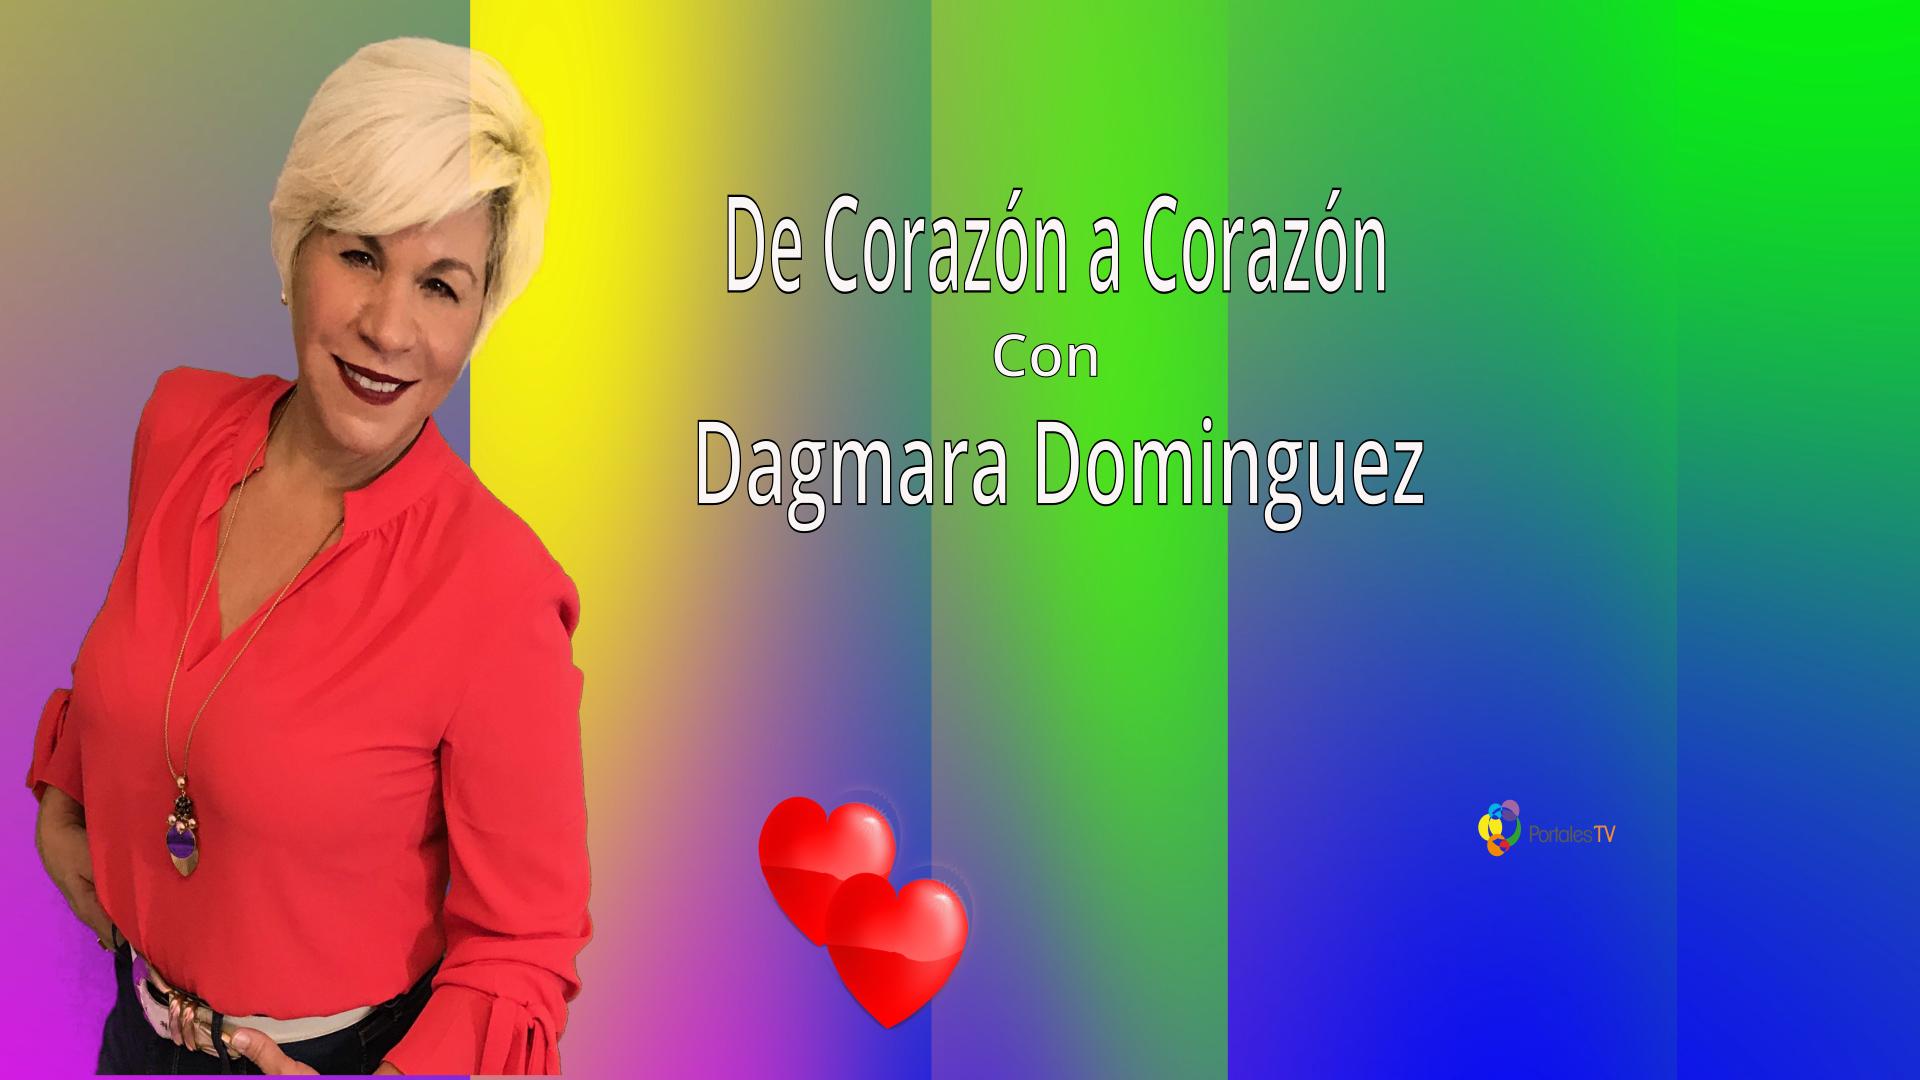 De Corazon a Corazon